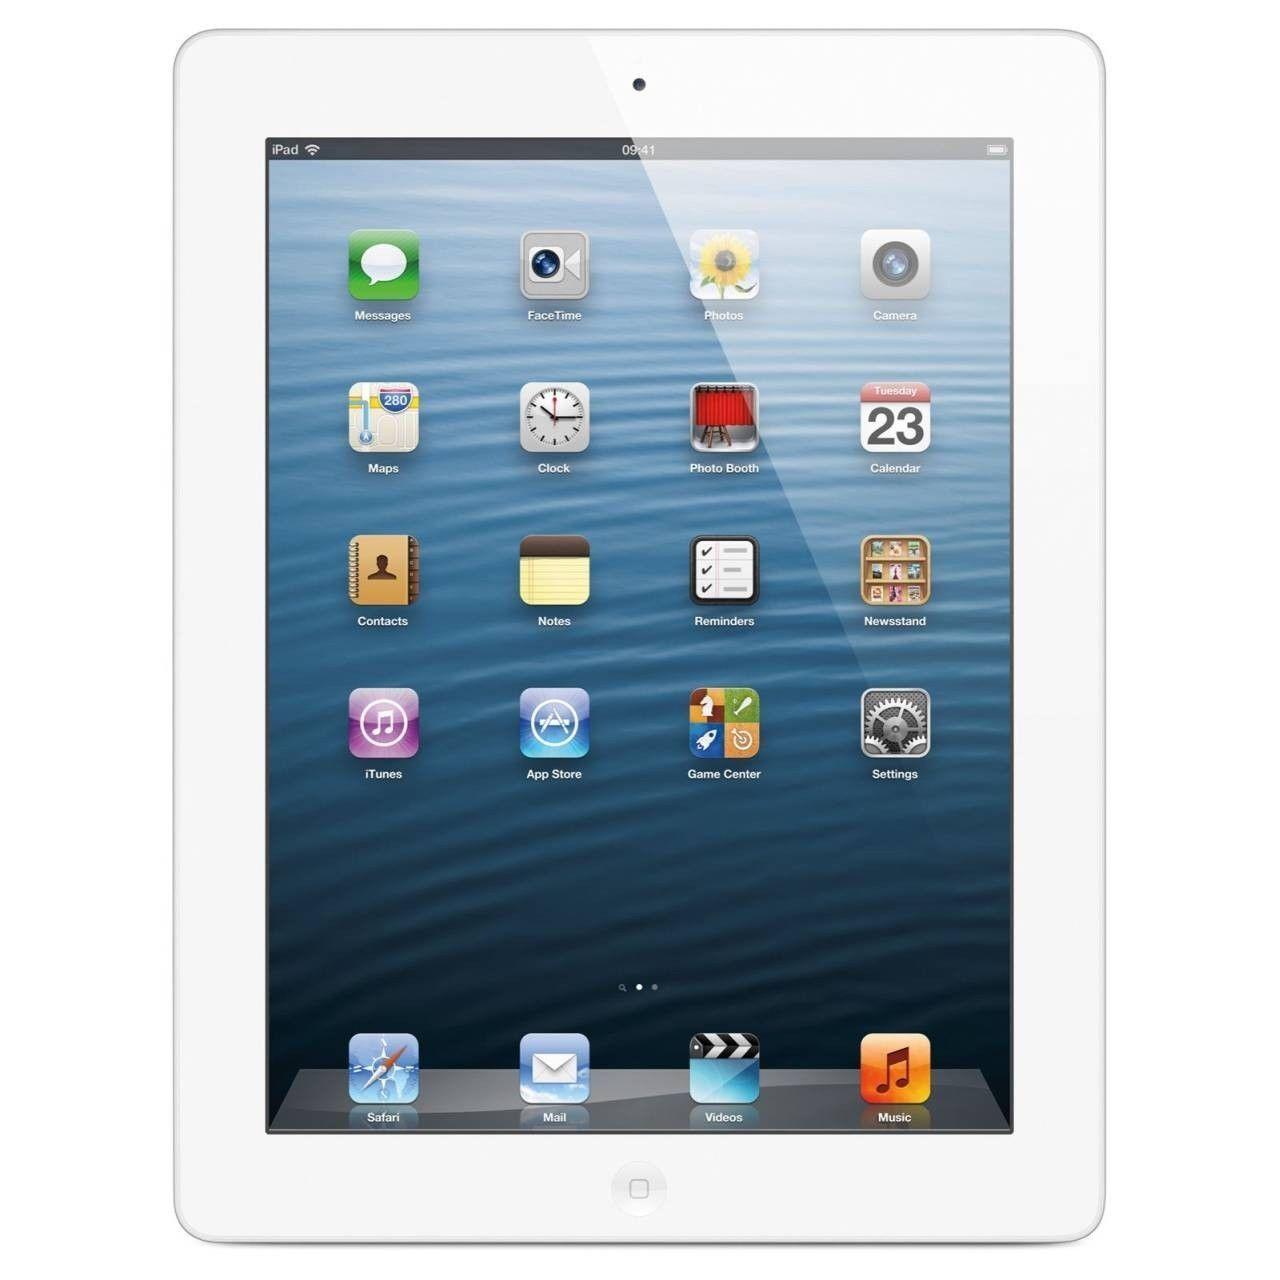 Apple iPad 2 64GB, Wi-Fi + 3G AT&T (Unlocked), 9.7in - WHITE - Grade A (R)